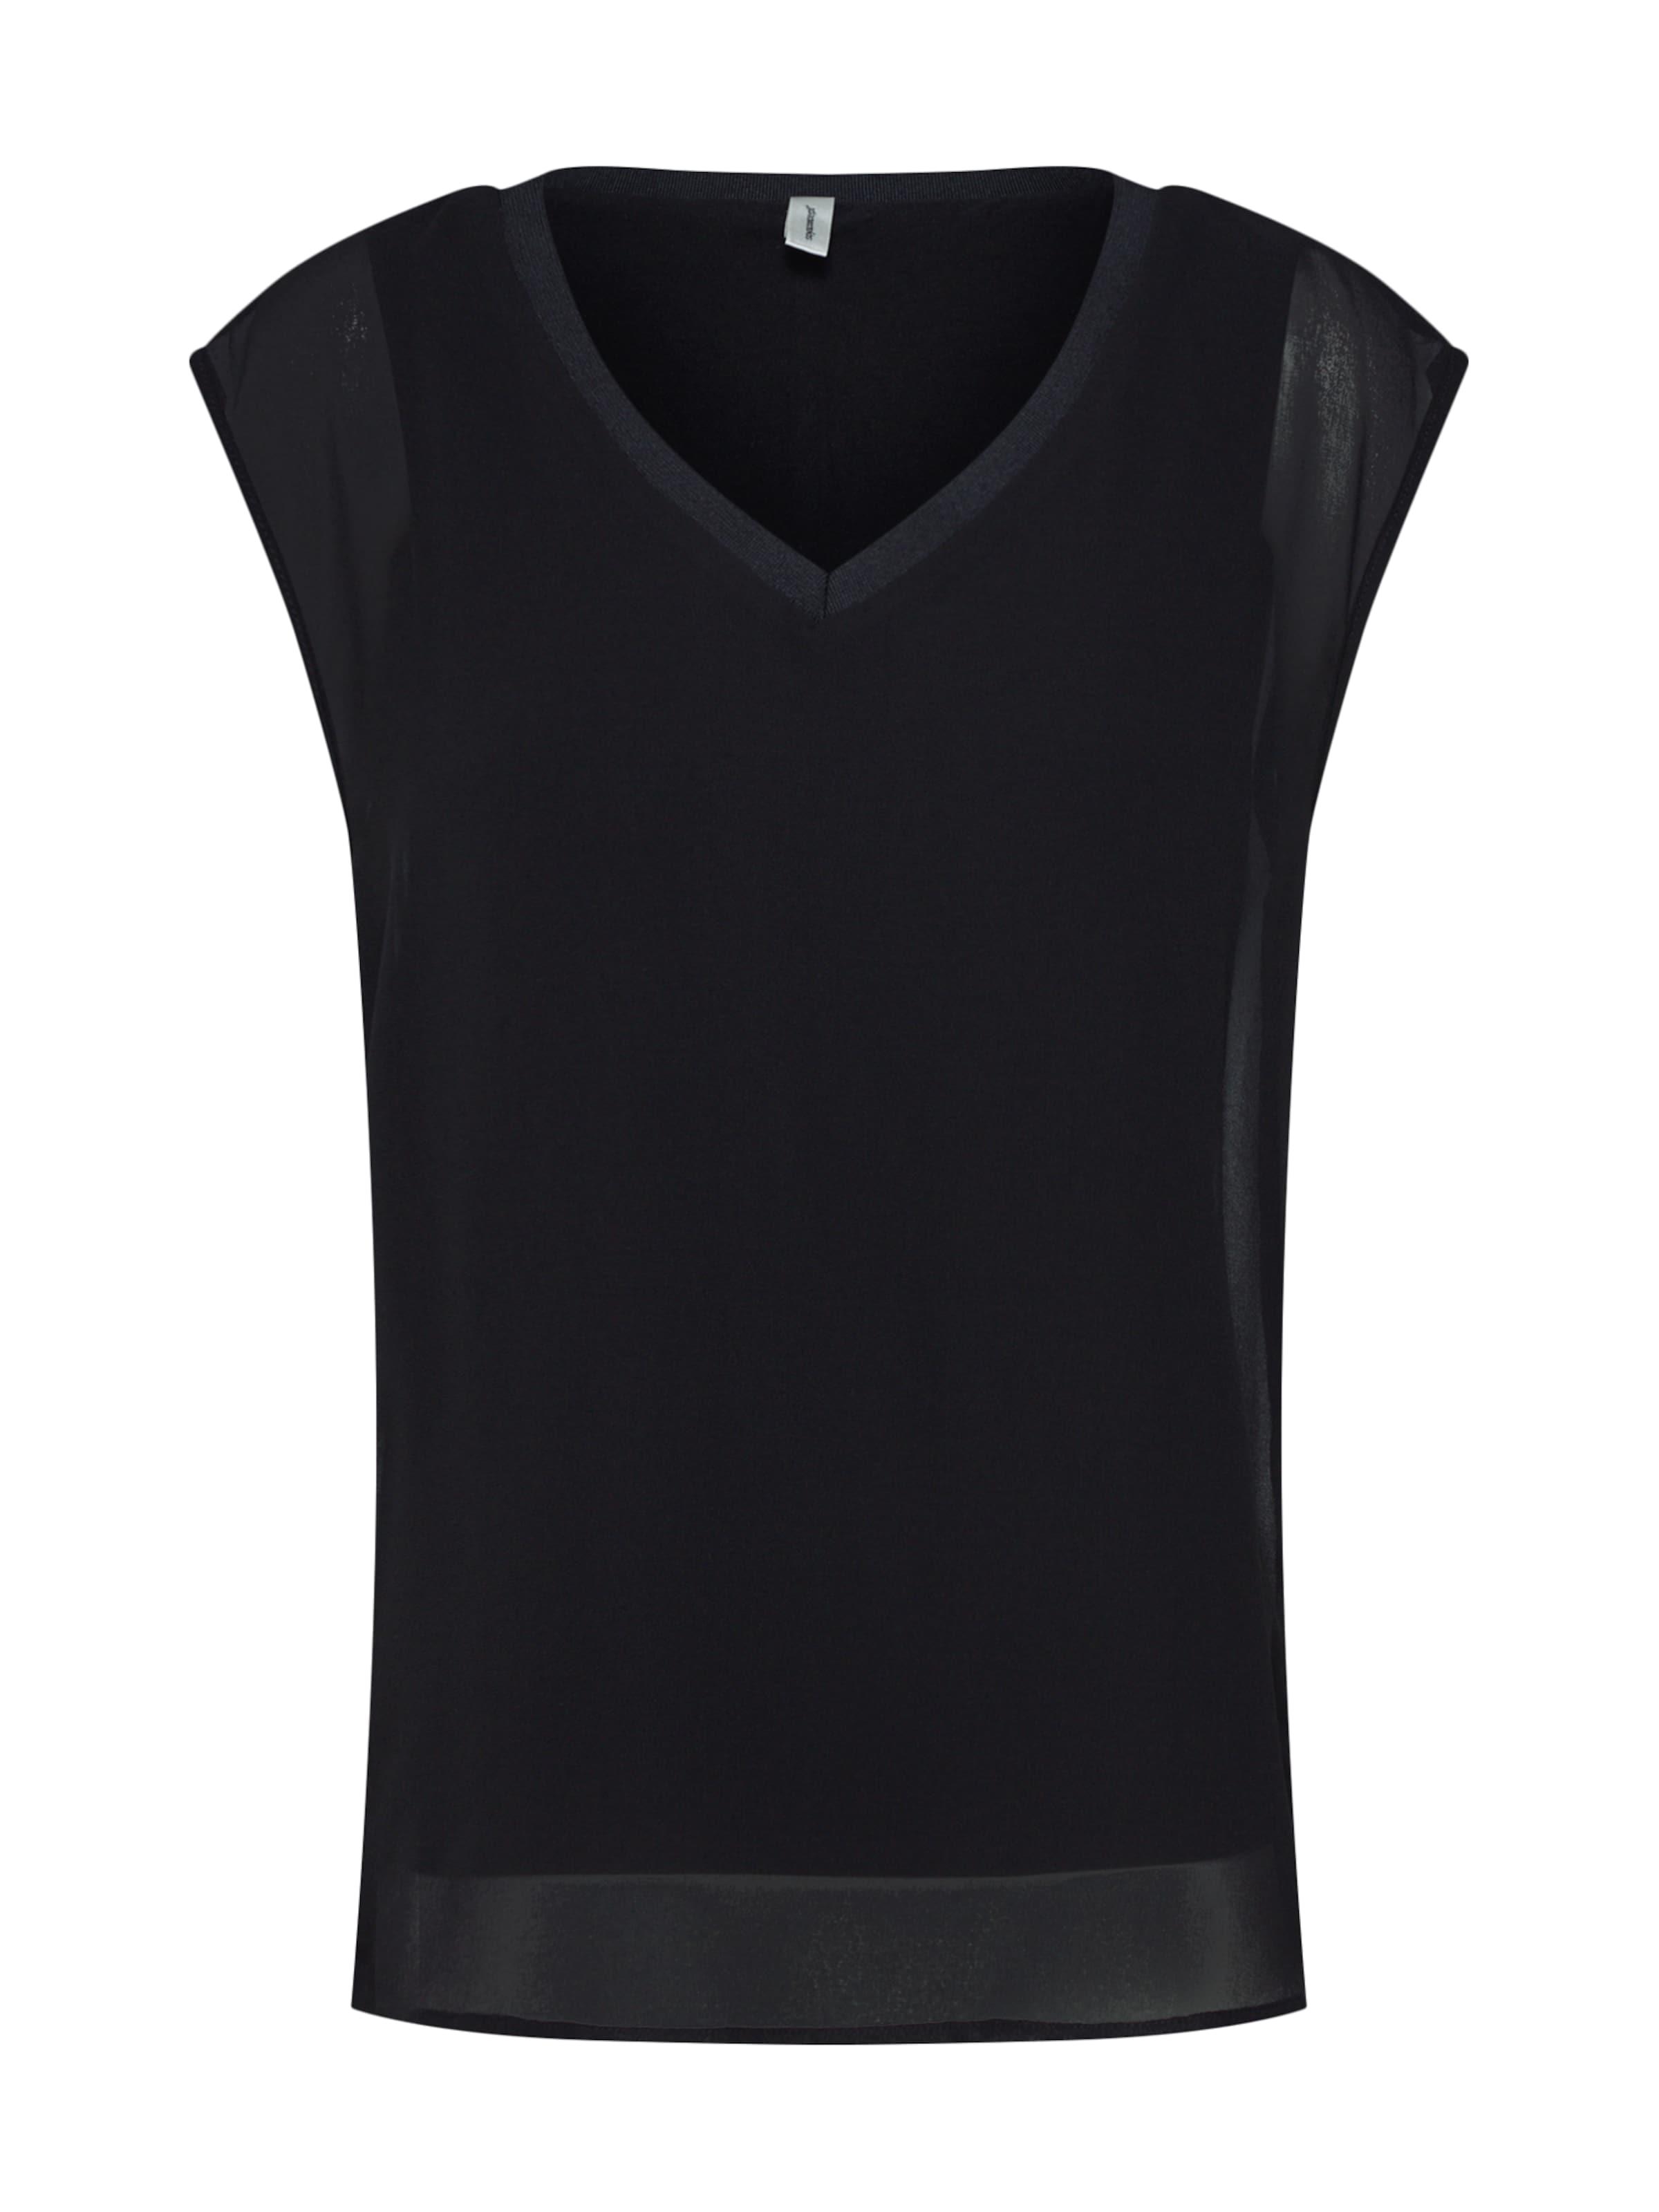 Soyaconcept In T 'sc odina Schwarz shirt 1' QrdhtCsx